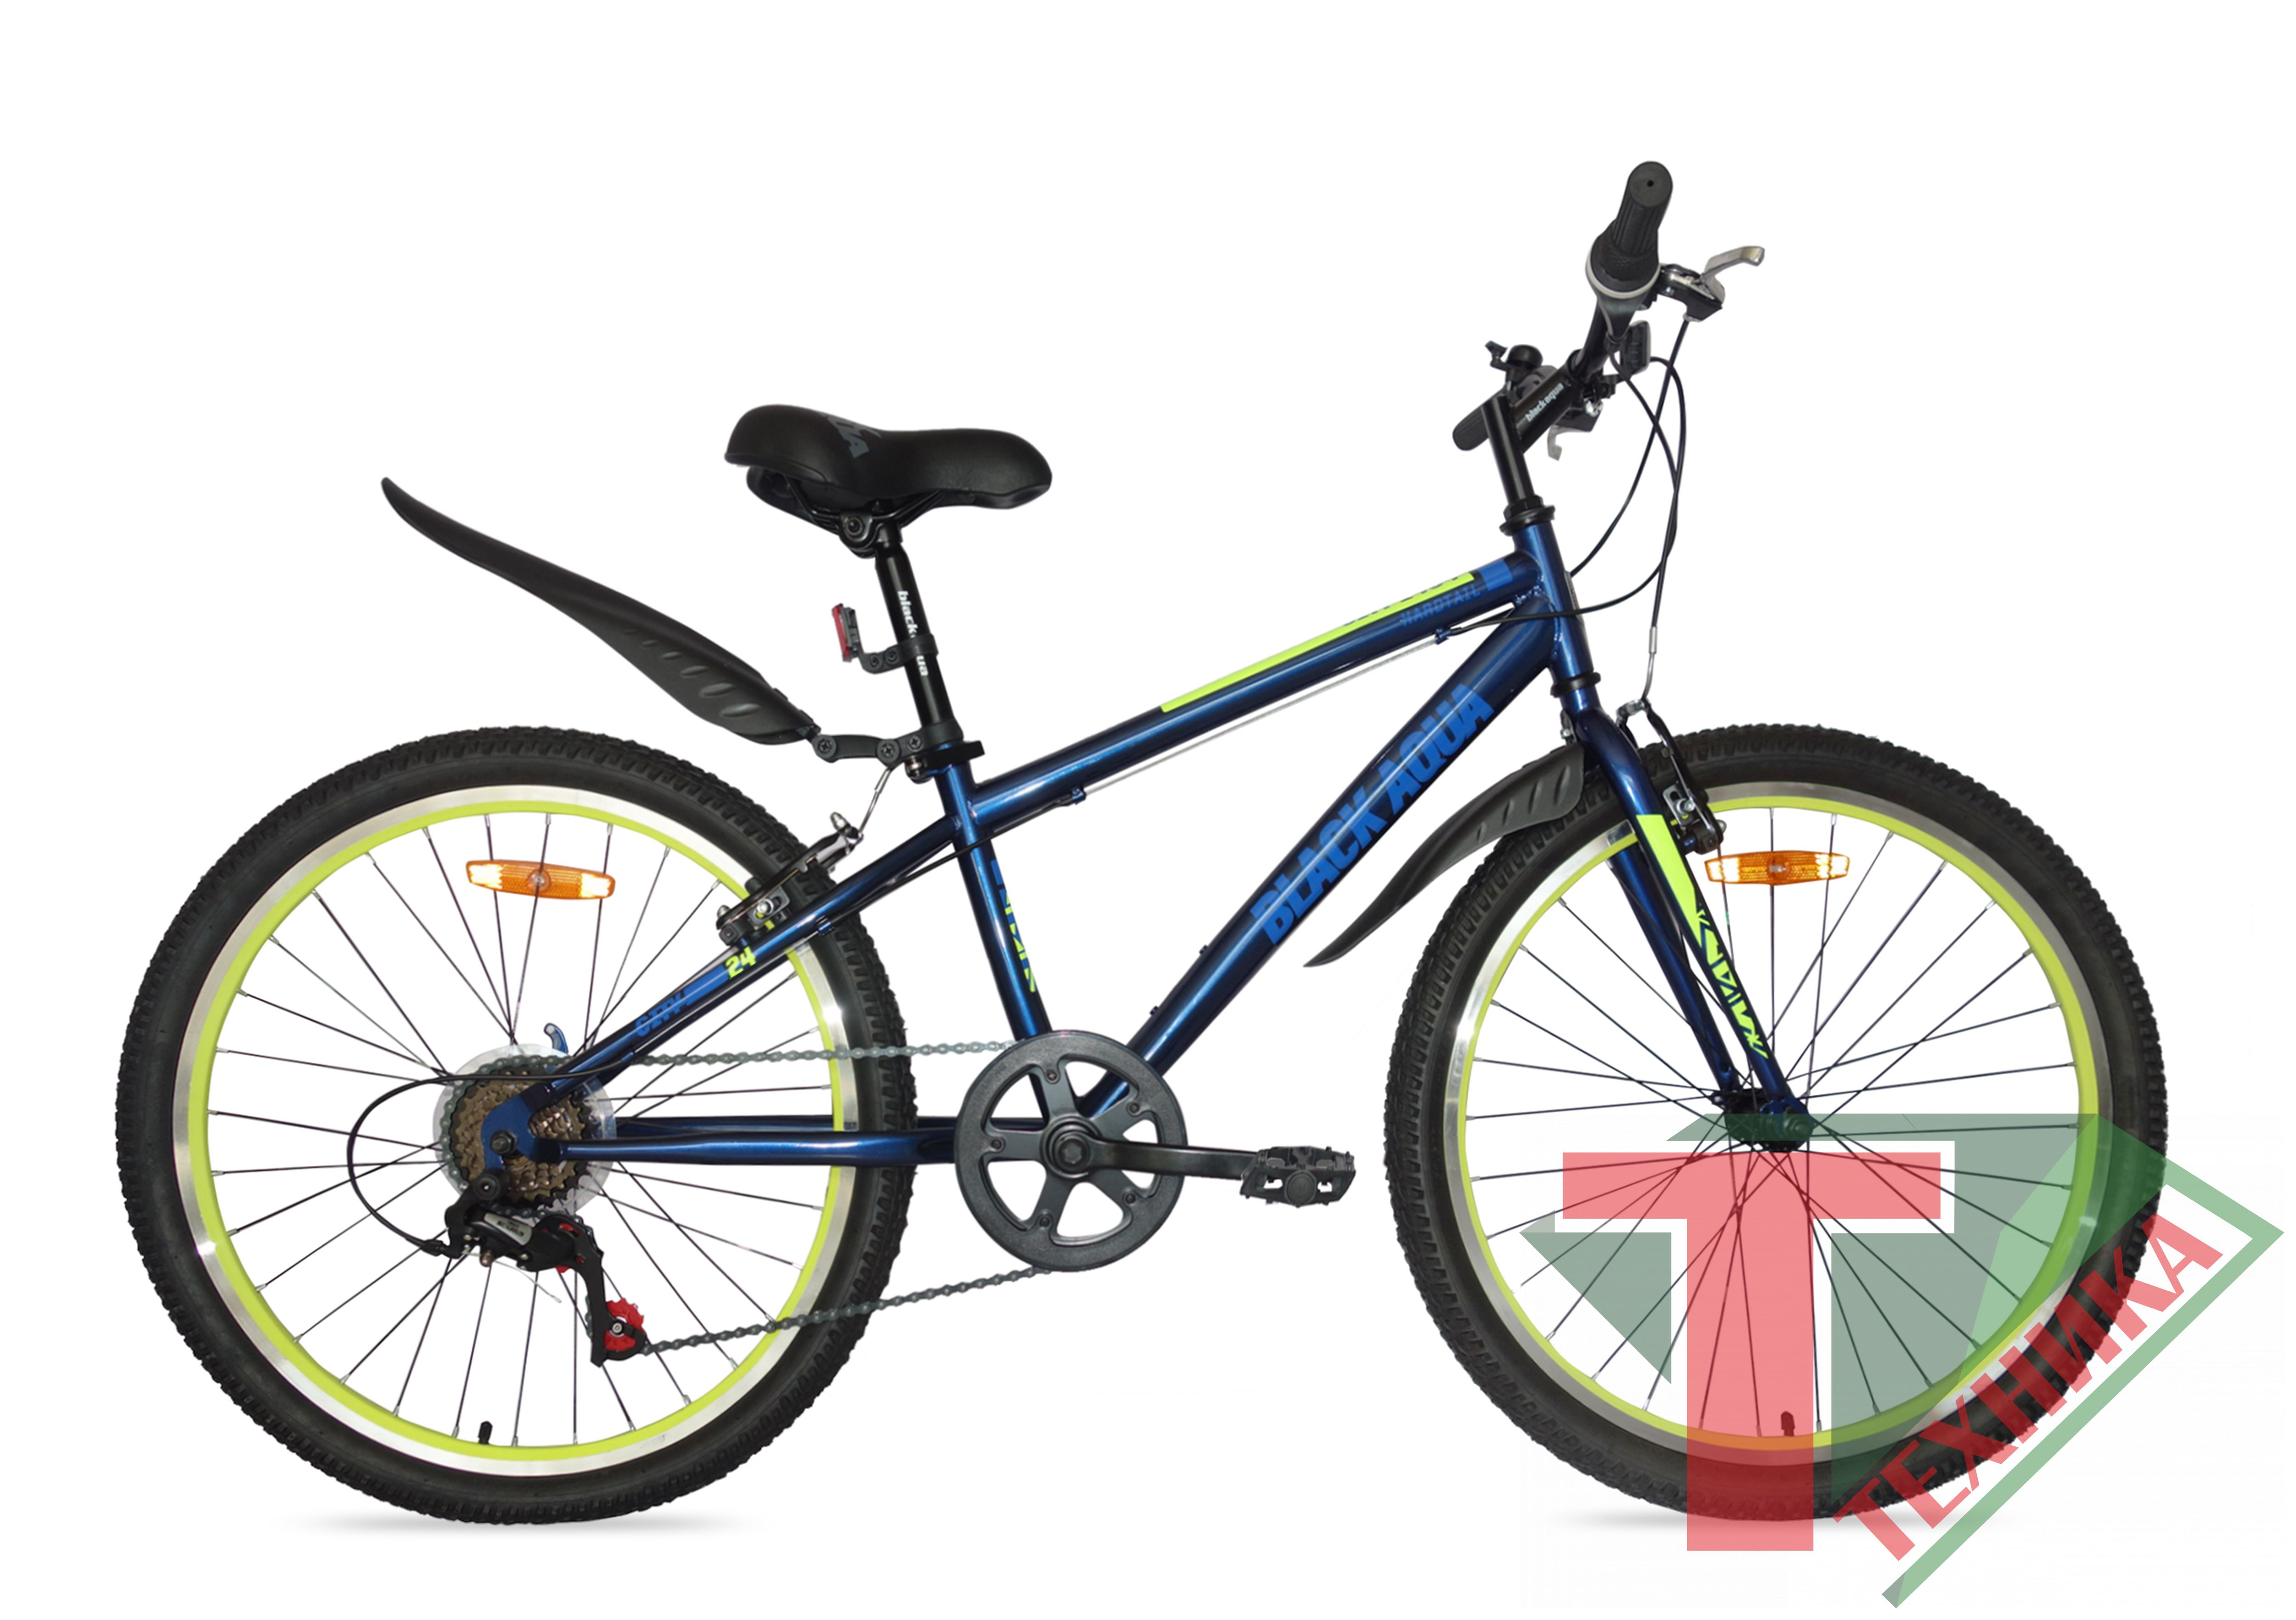 Велосипед GL-201V Black aqua City 1401V matt 24